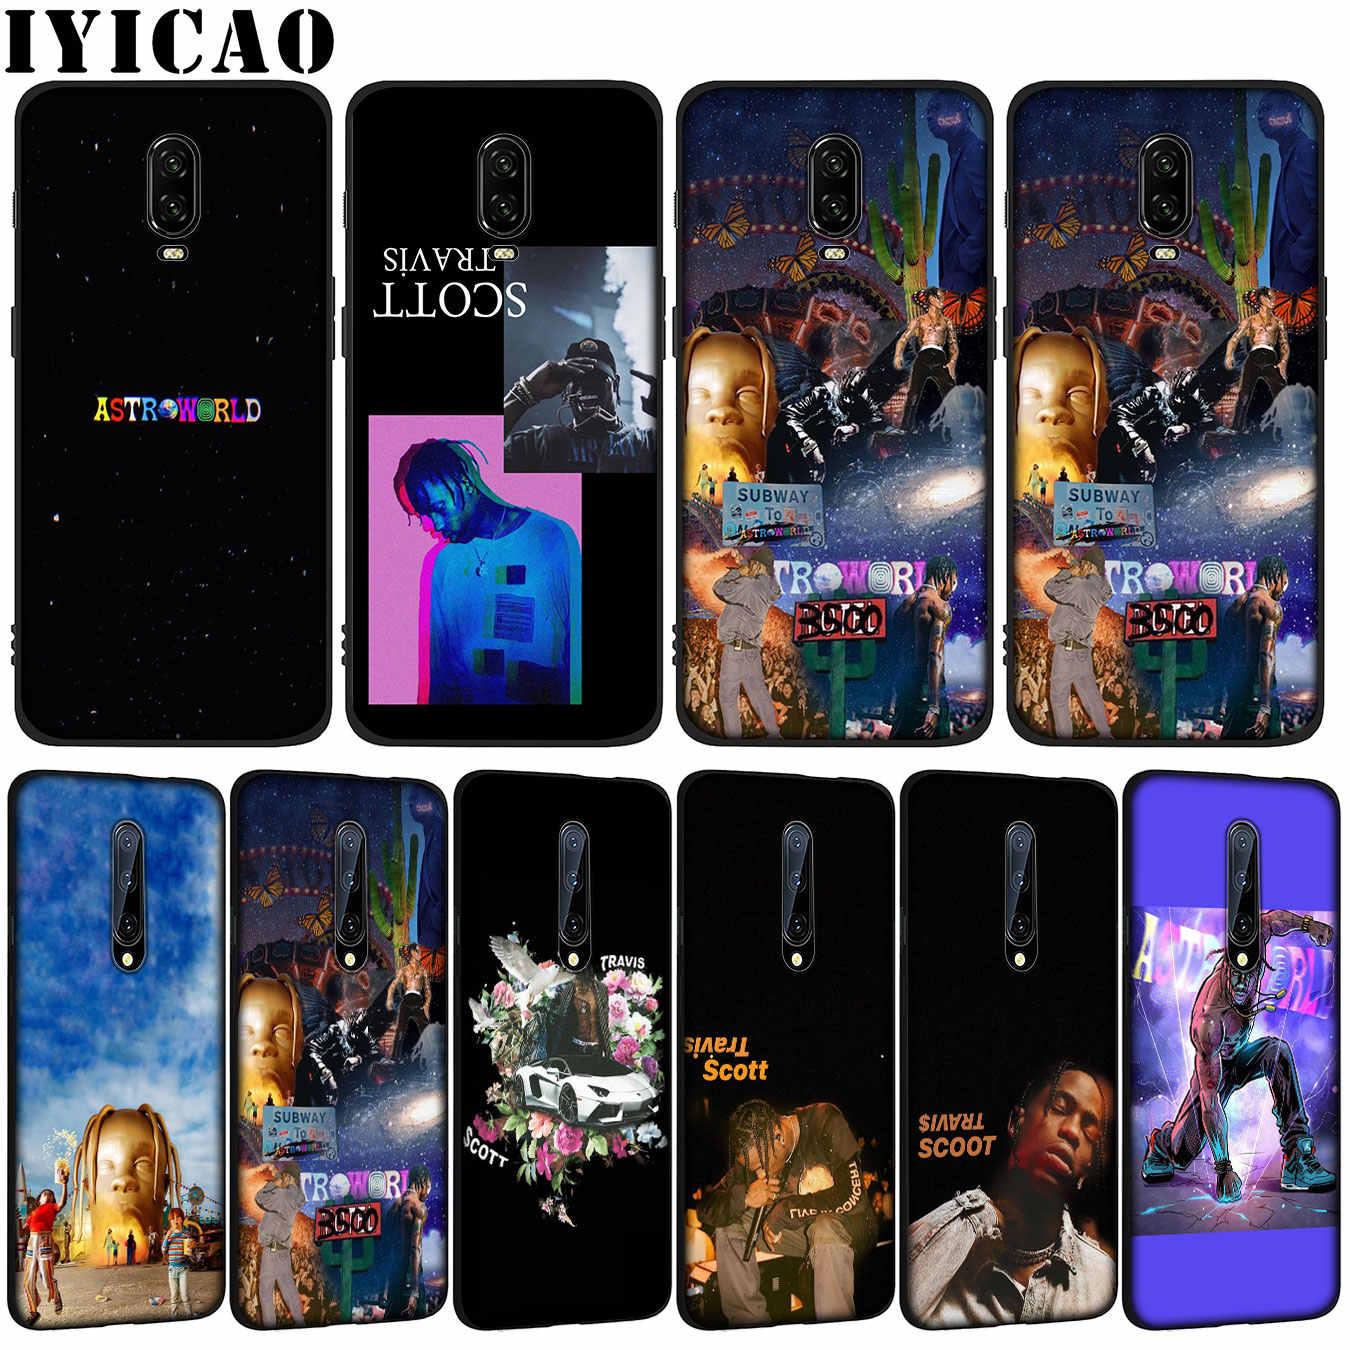 Astrodome de Travis Scott pop suave TPU de silicona negro teléfono caso OnePlus 7T 7 Pro 6T 5T 5 uno más 7Pro cubierta